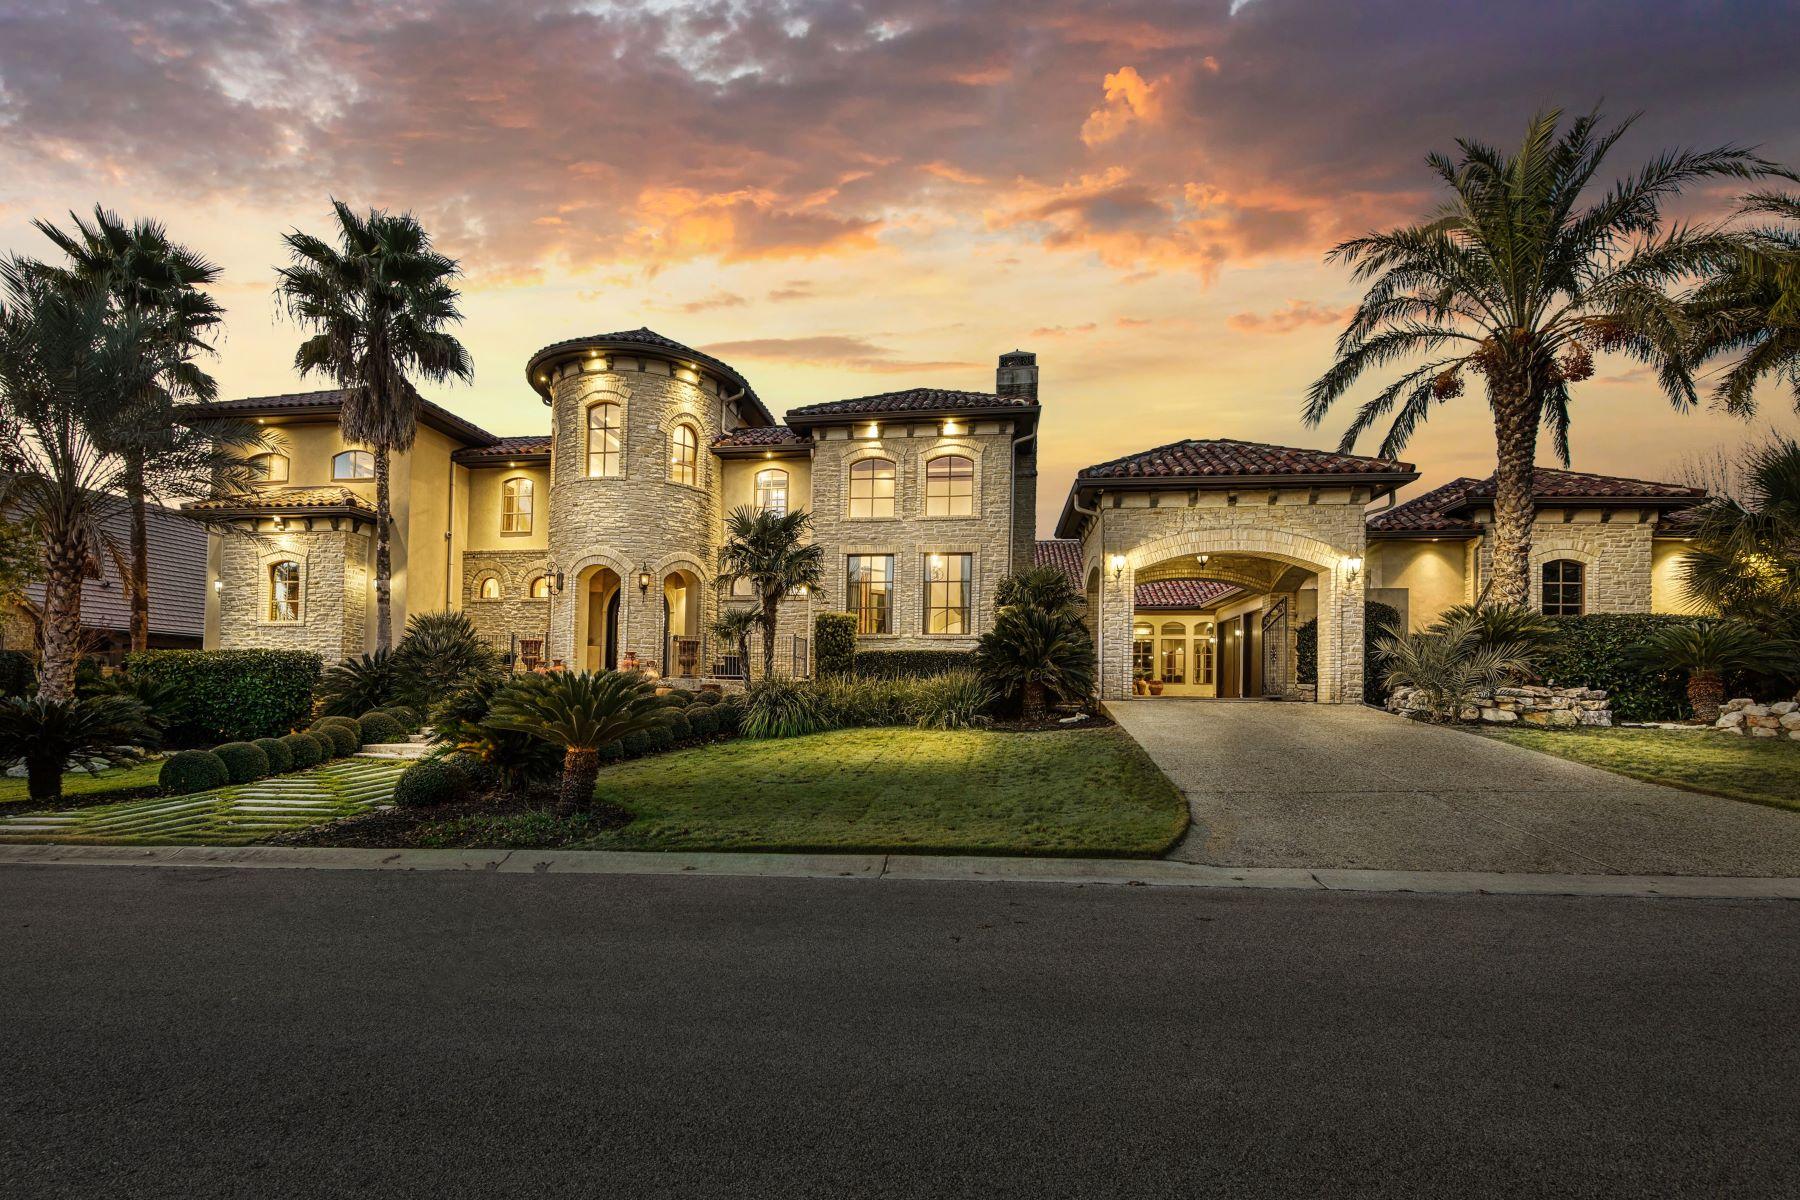 Single Family Homes for Sale at Magnificent Dominion Estate 15 Esquire, San Antonio, Texas 78257 United States